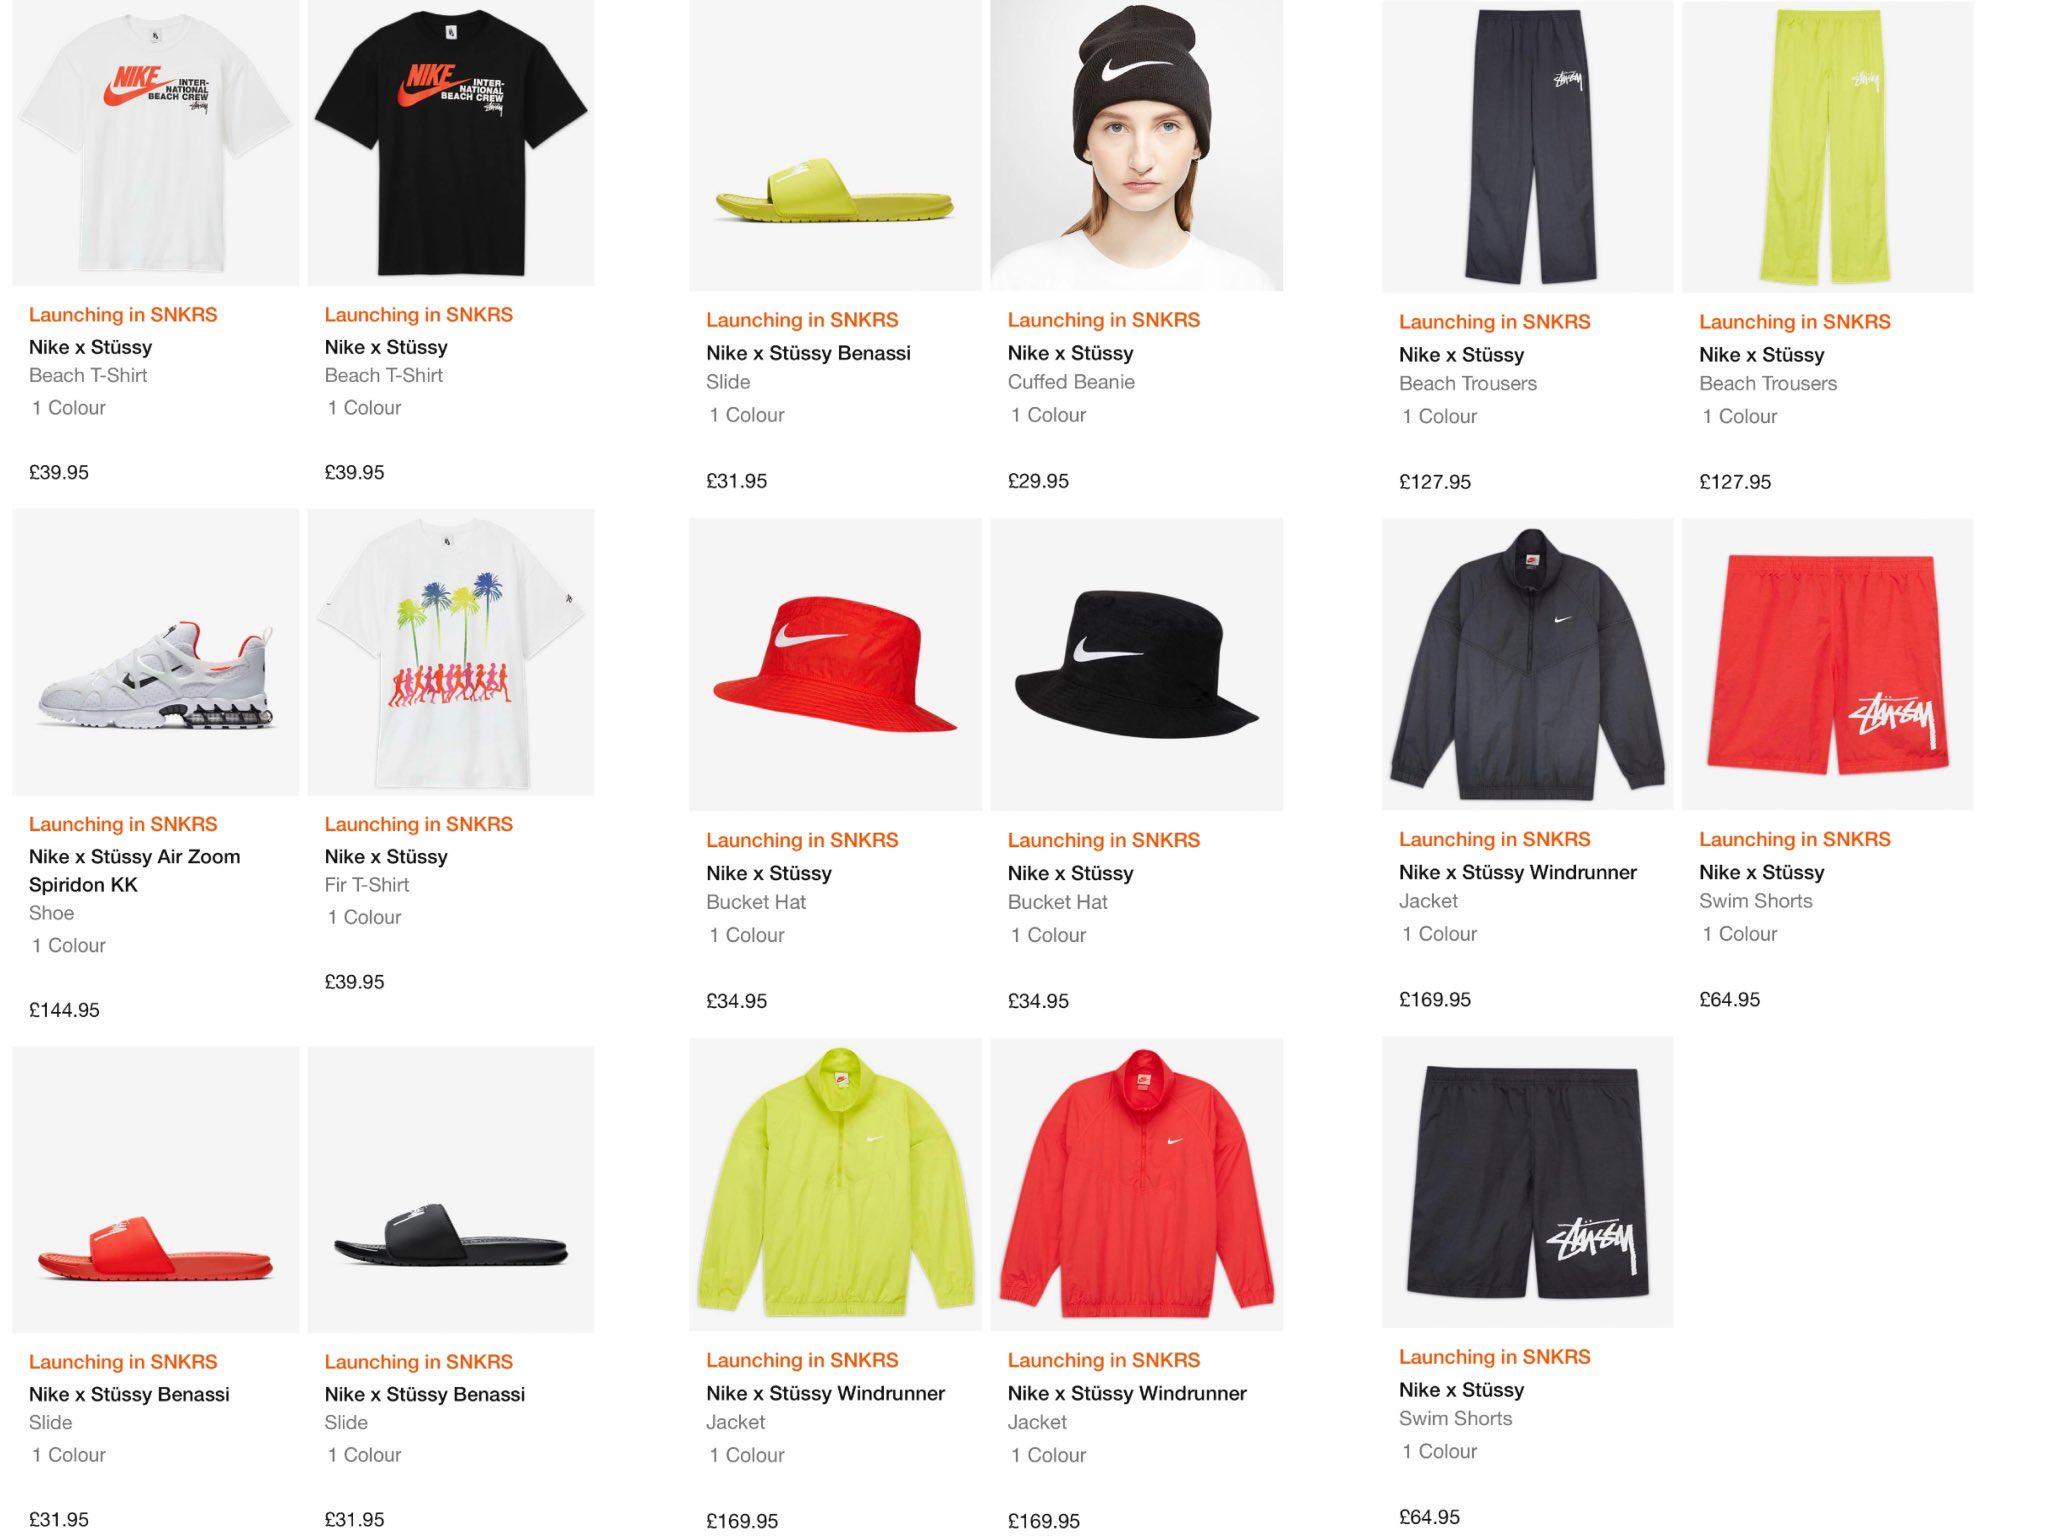 Snkr Twitr On Twitter Live In 10mins Via Nike Eu Stussy X Nike Full Collection Https T Co Mv88fd7j9i No Us Shipping Ad